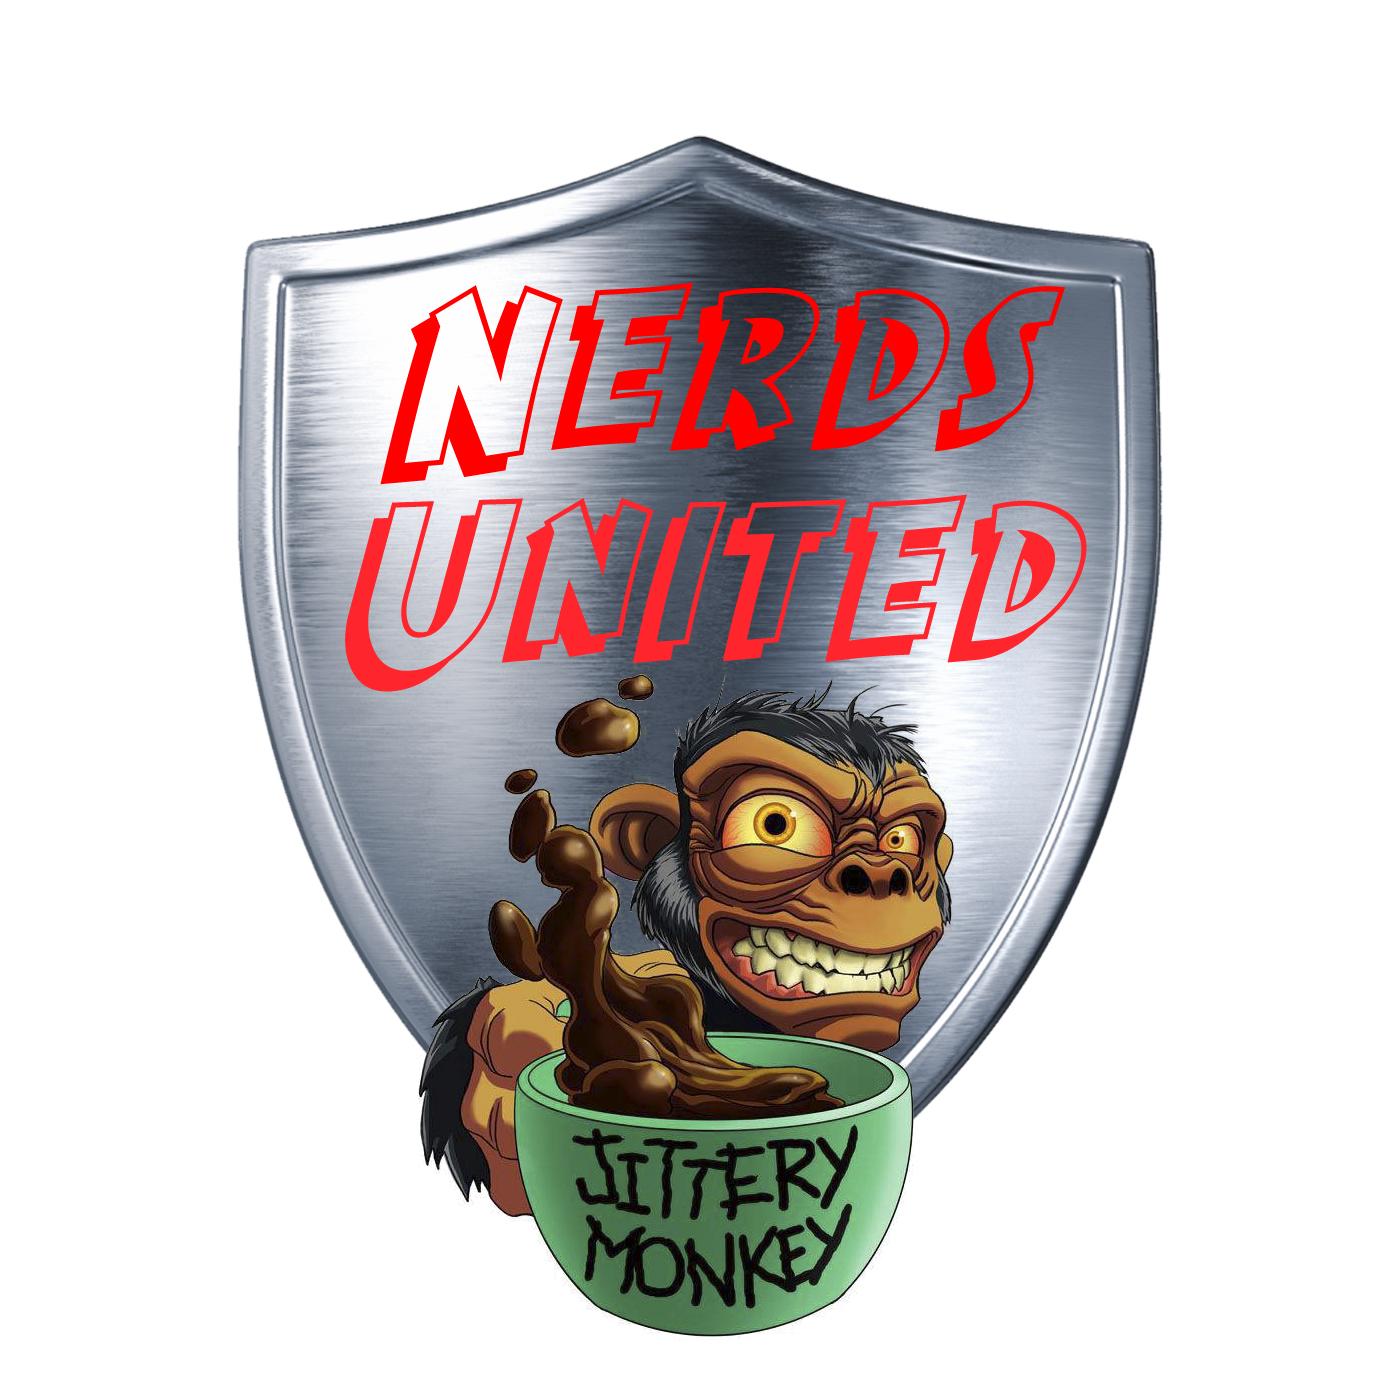 Jittery Monkey Podcasting Network » Nerds United